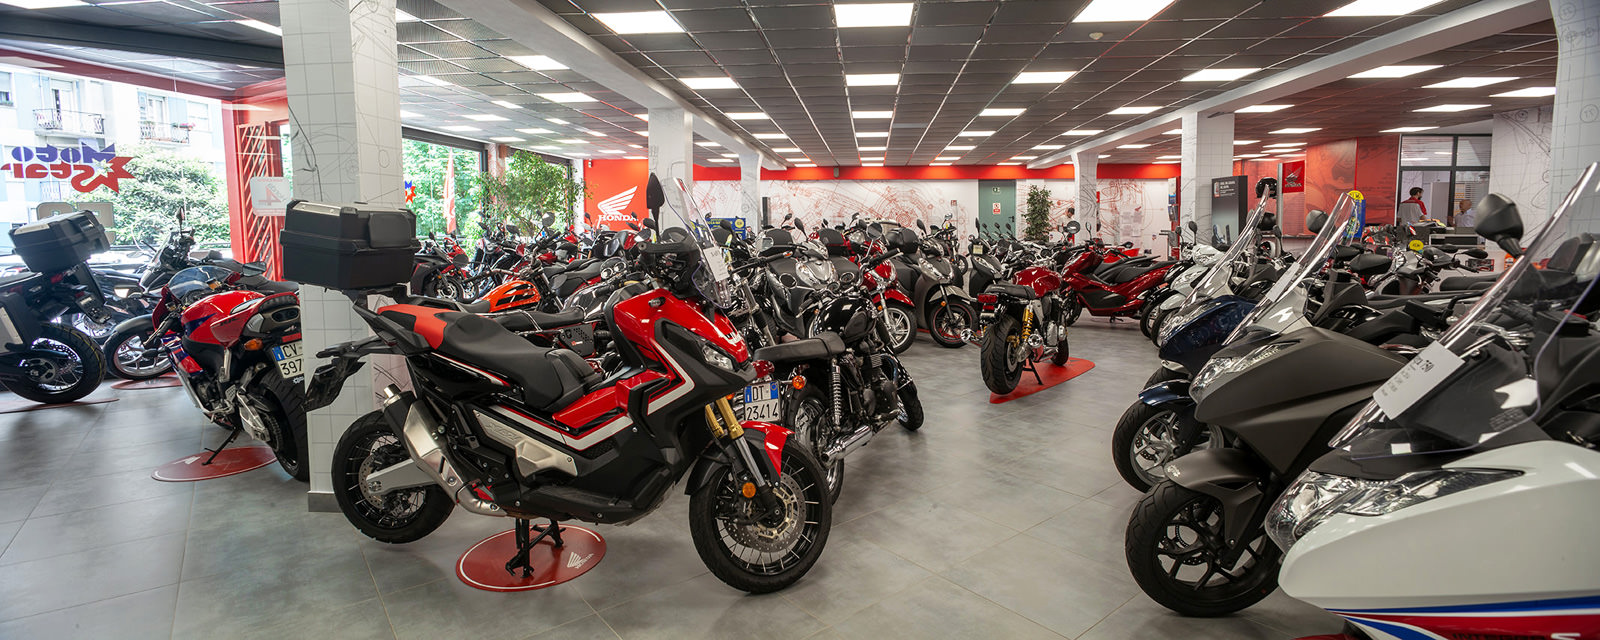 Motostar Honda Milano